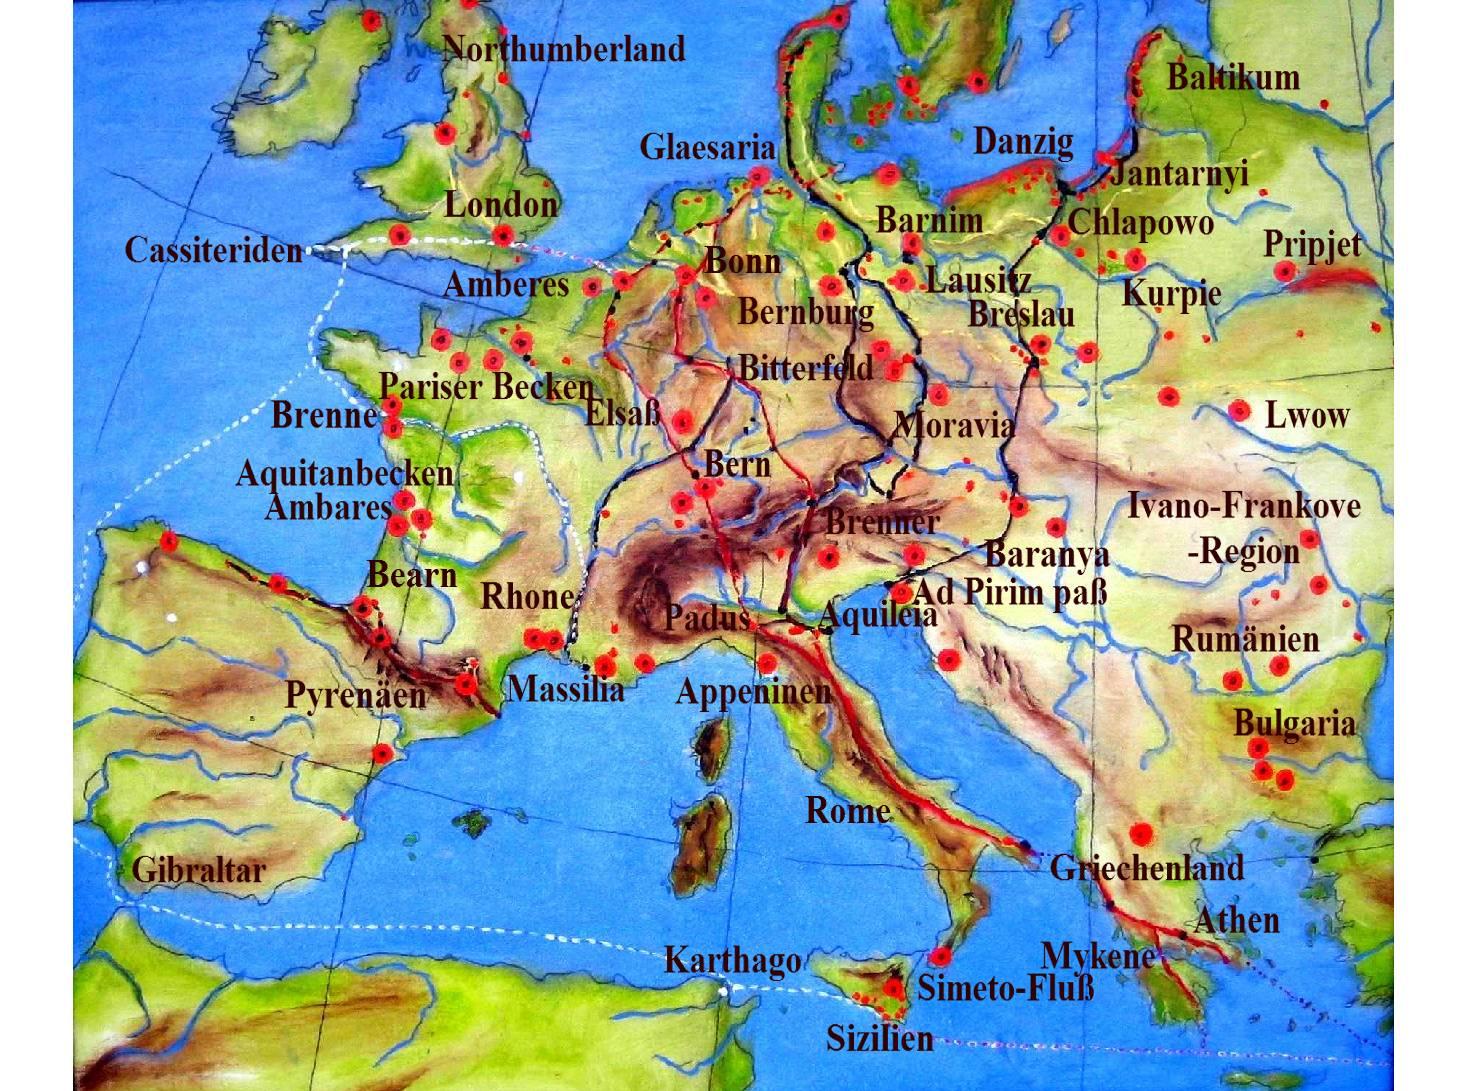 Amber deposits in Europe